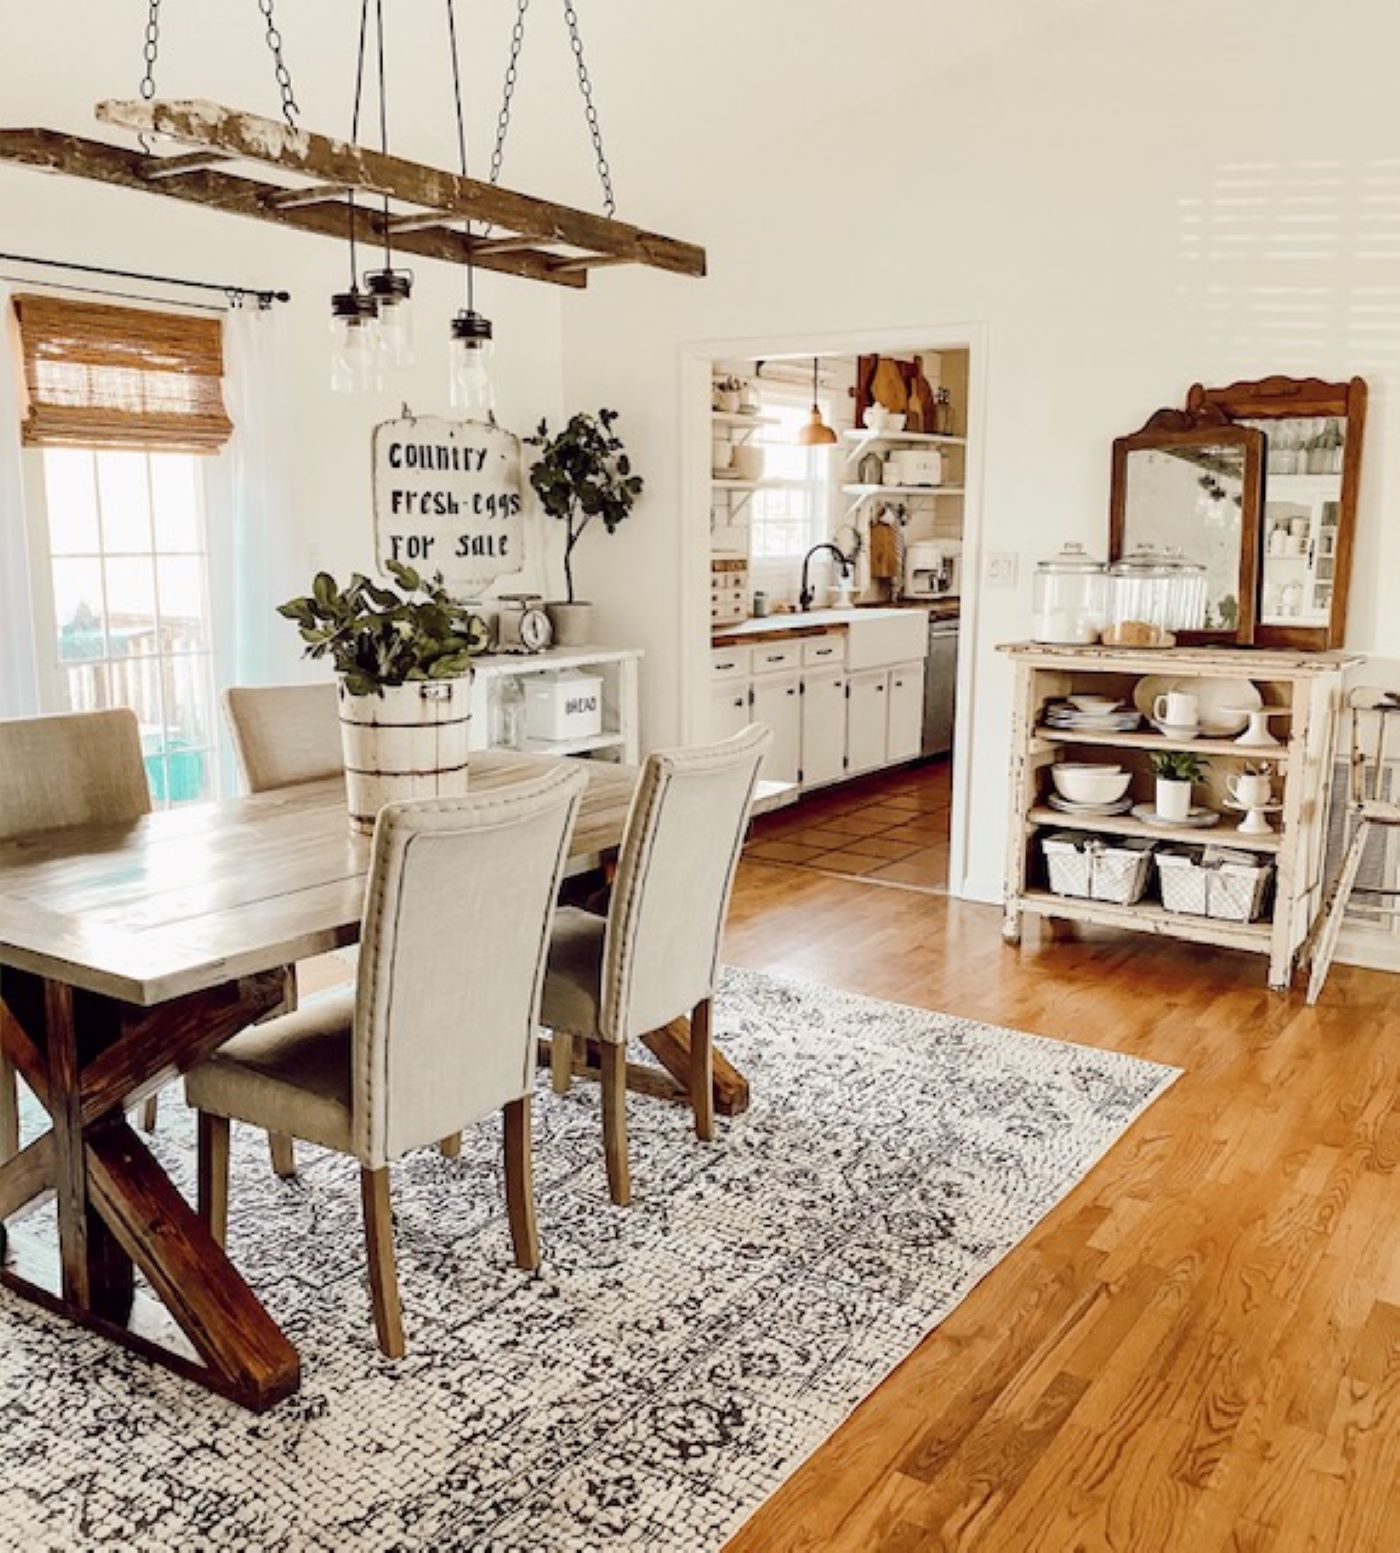 A Flea Market Farmhouse American, Farmhouse Style Dining Room Rugs